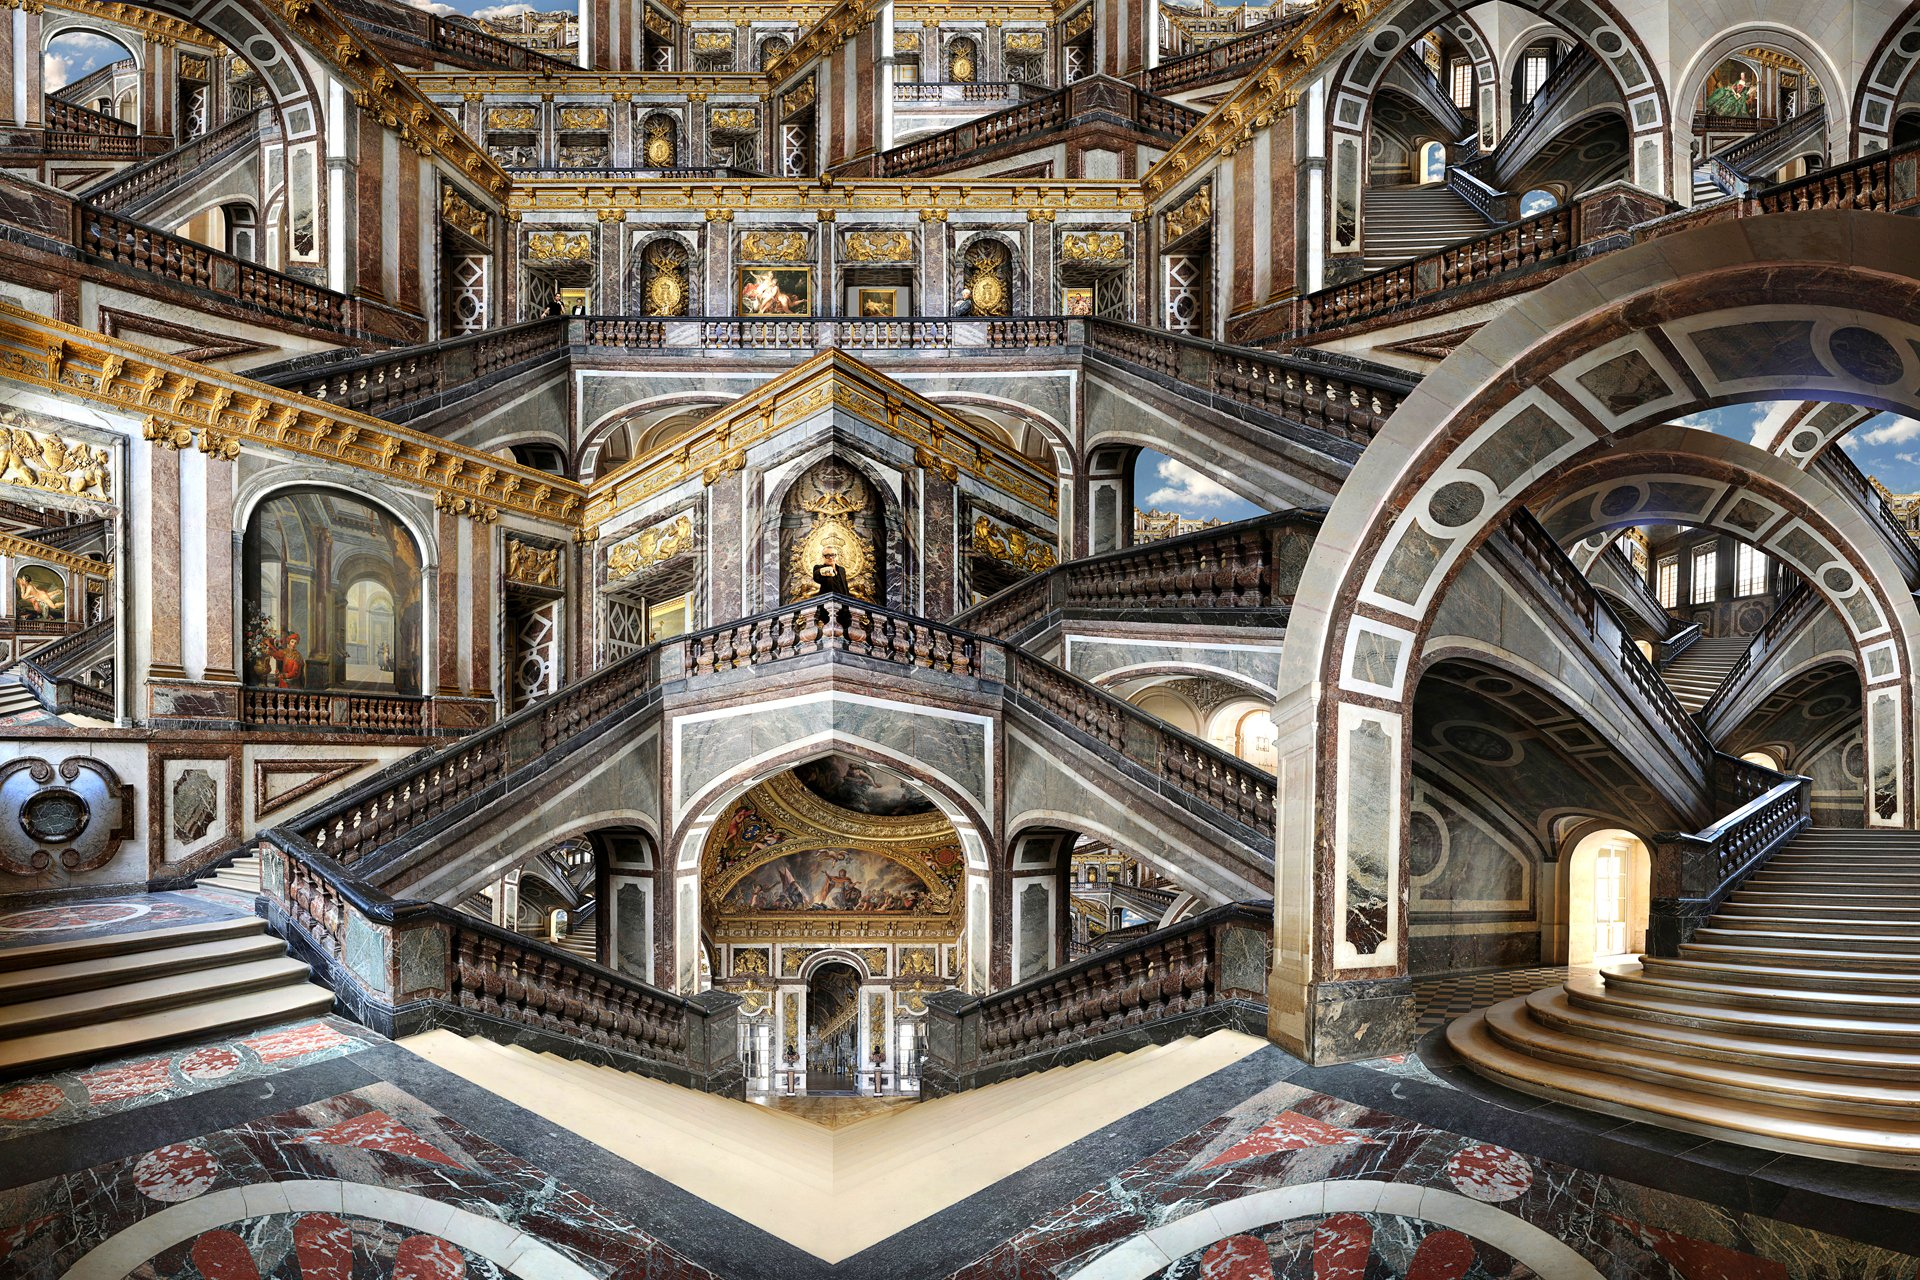 Palace of versailles wallpaper wallpapersafari Palace design